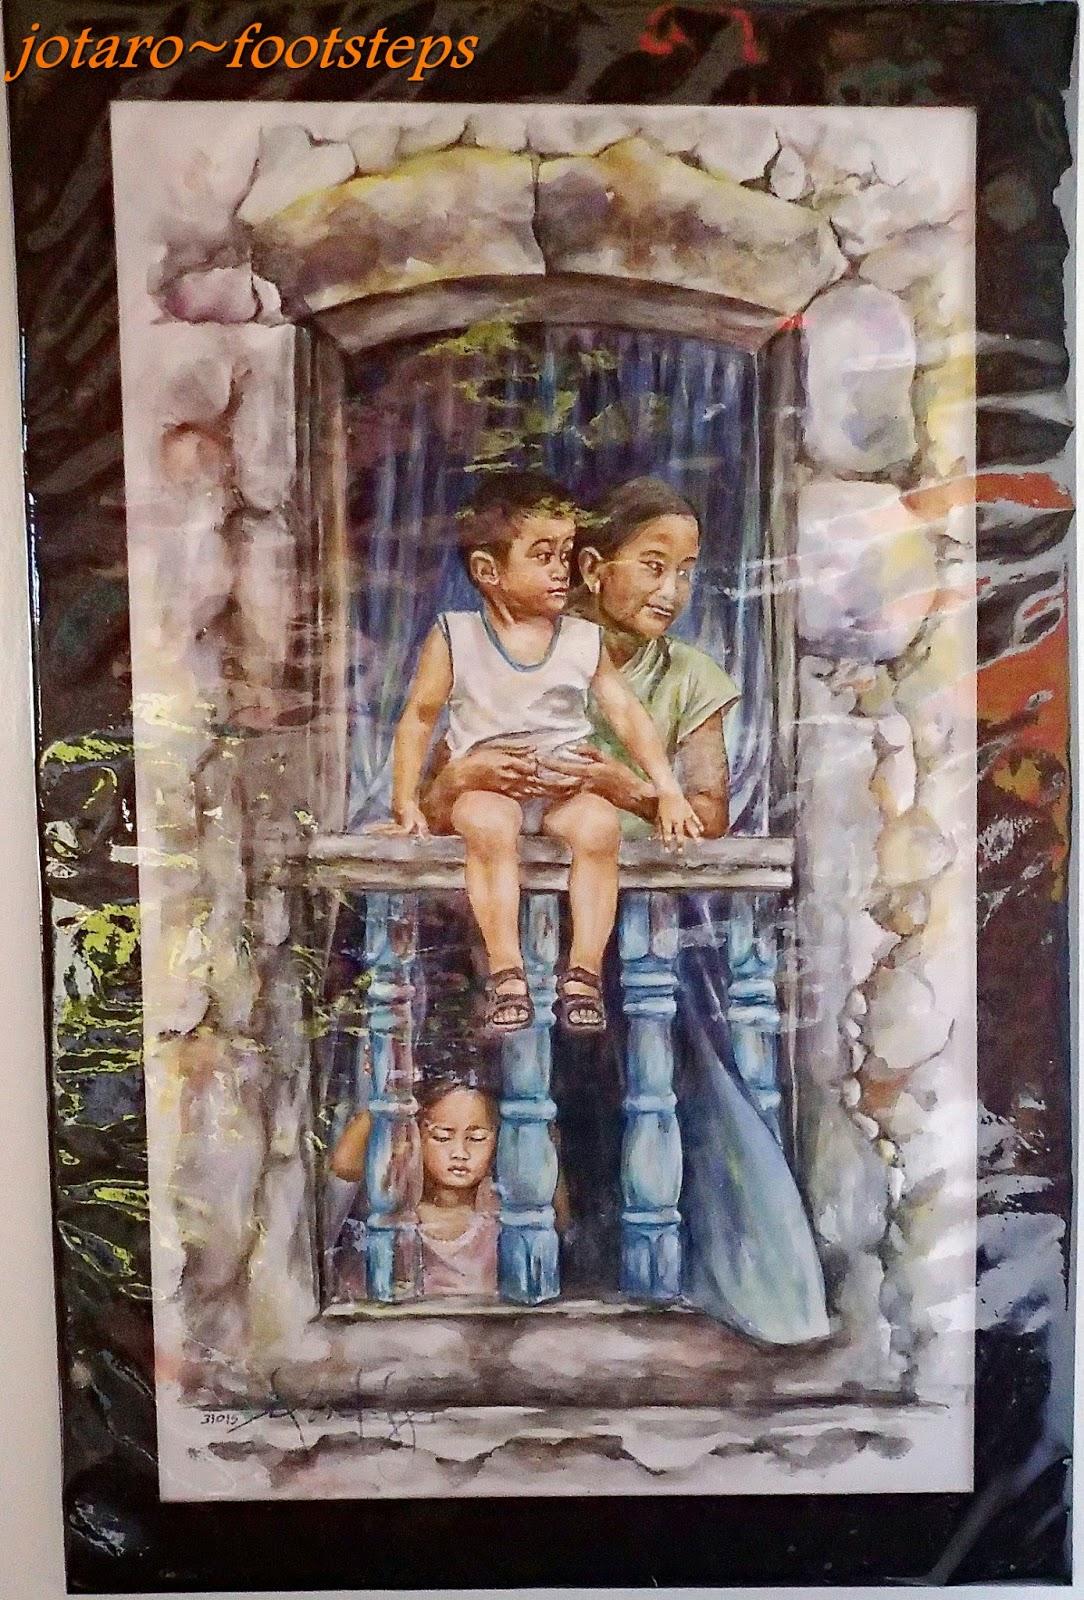 Footsteps - Jotaro's Travels: Art Gallery : Filipino ...